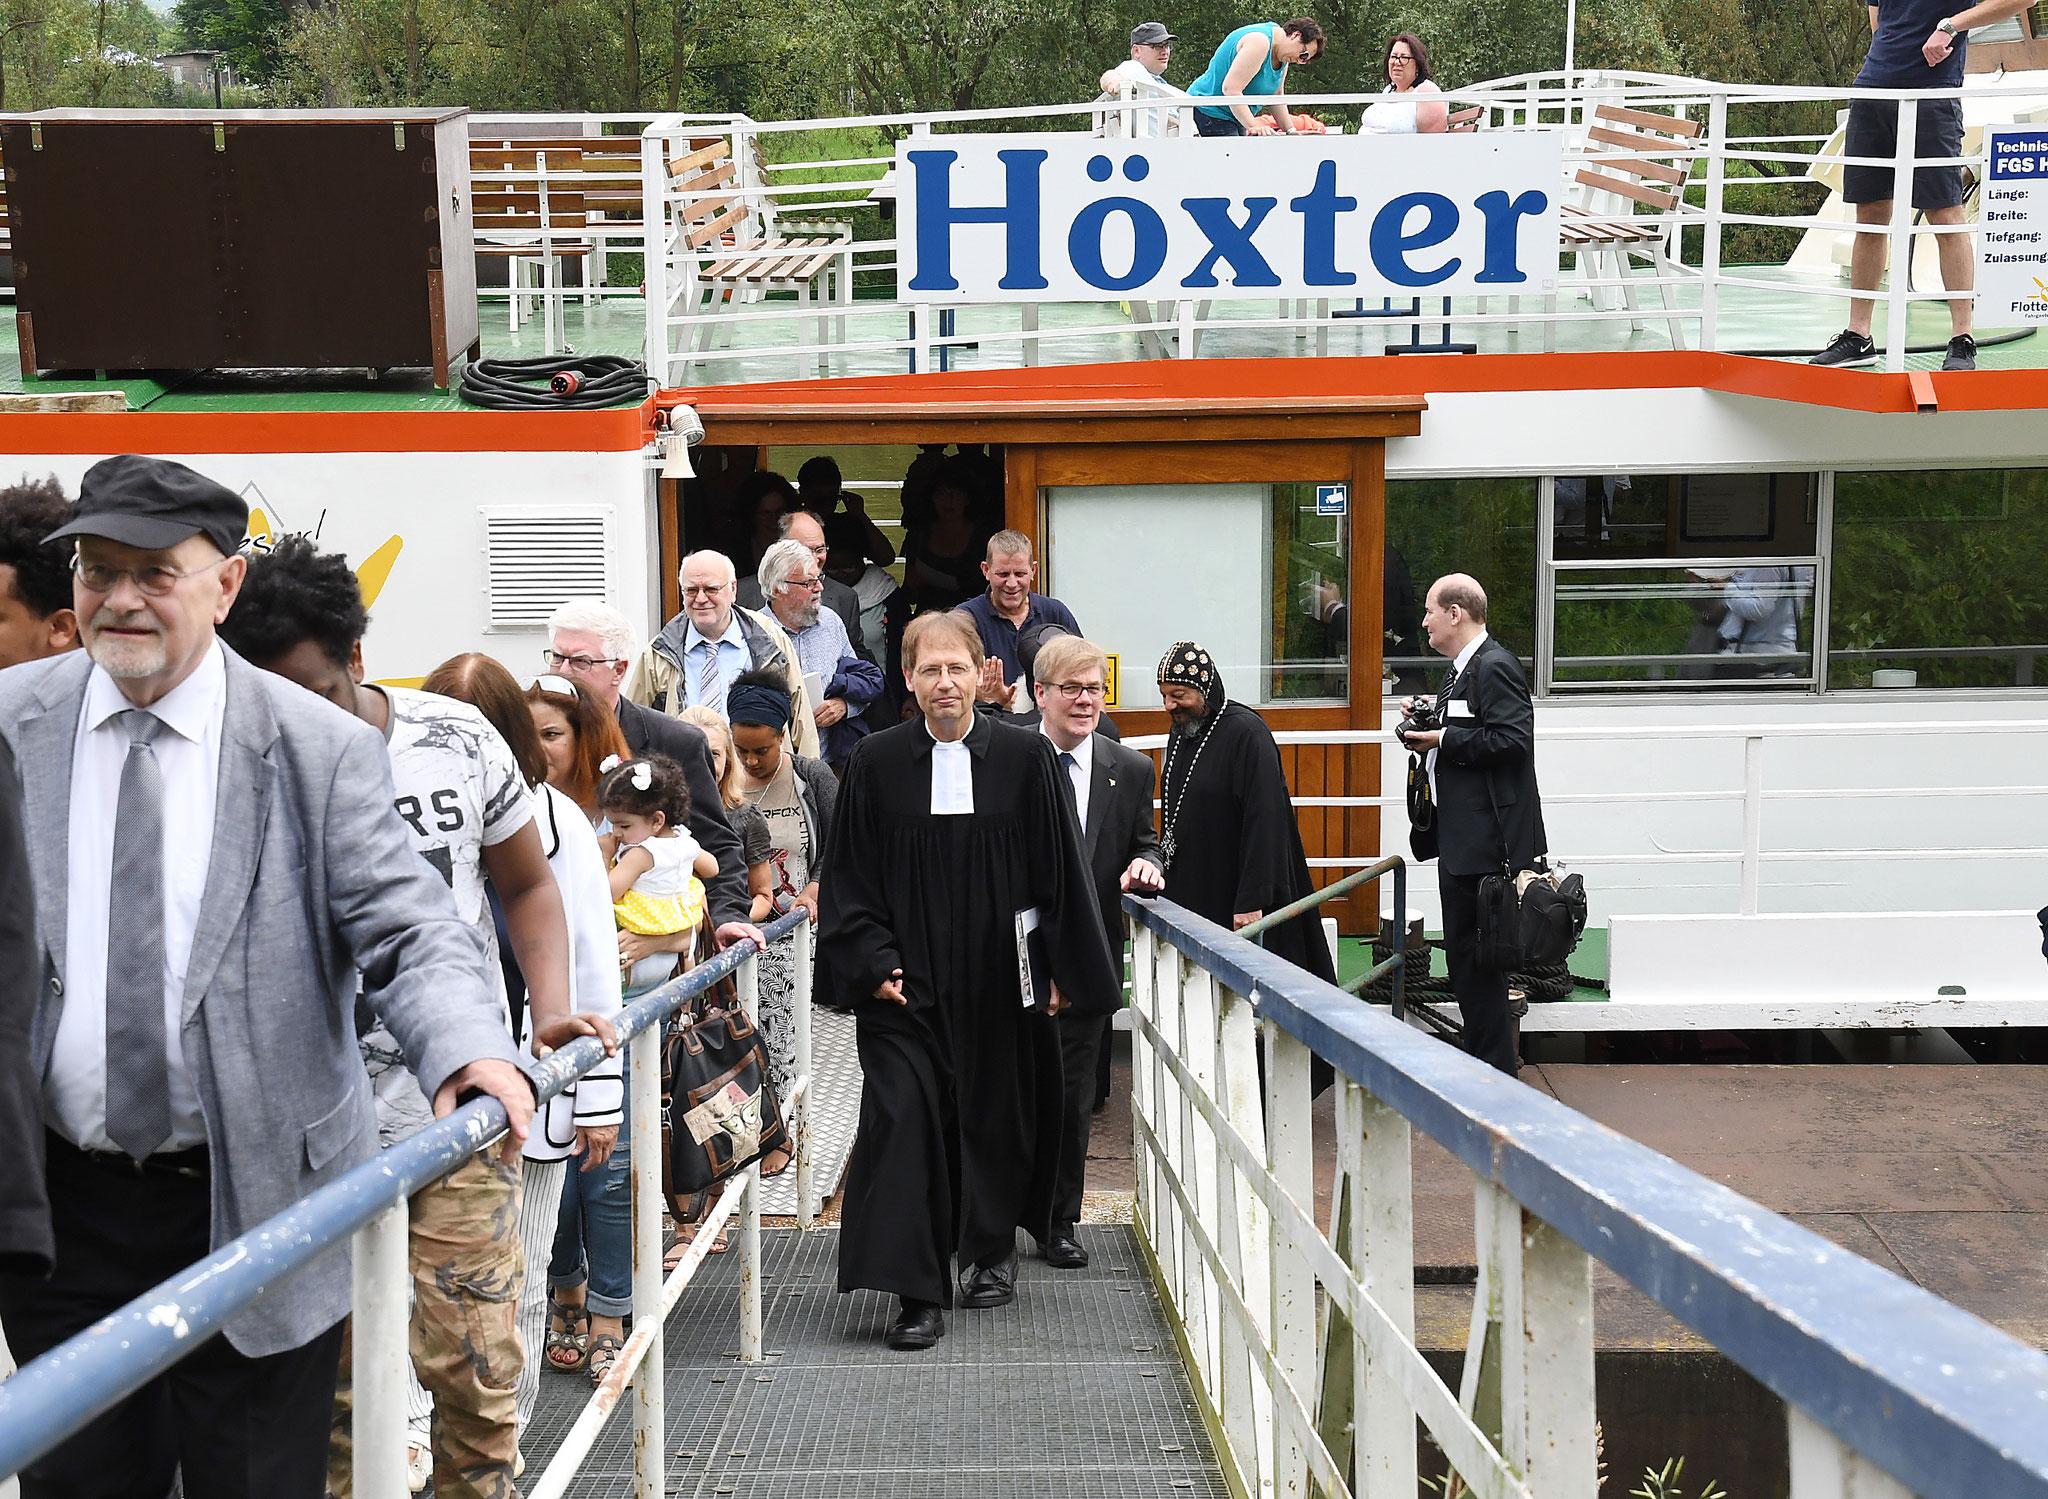 Ankunft der Flotte Weser in Höxter. Foto: Maria Hopp